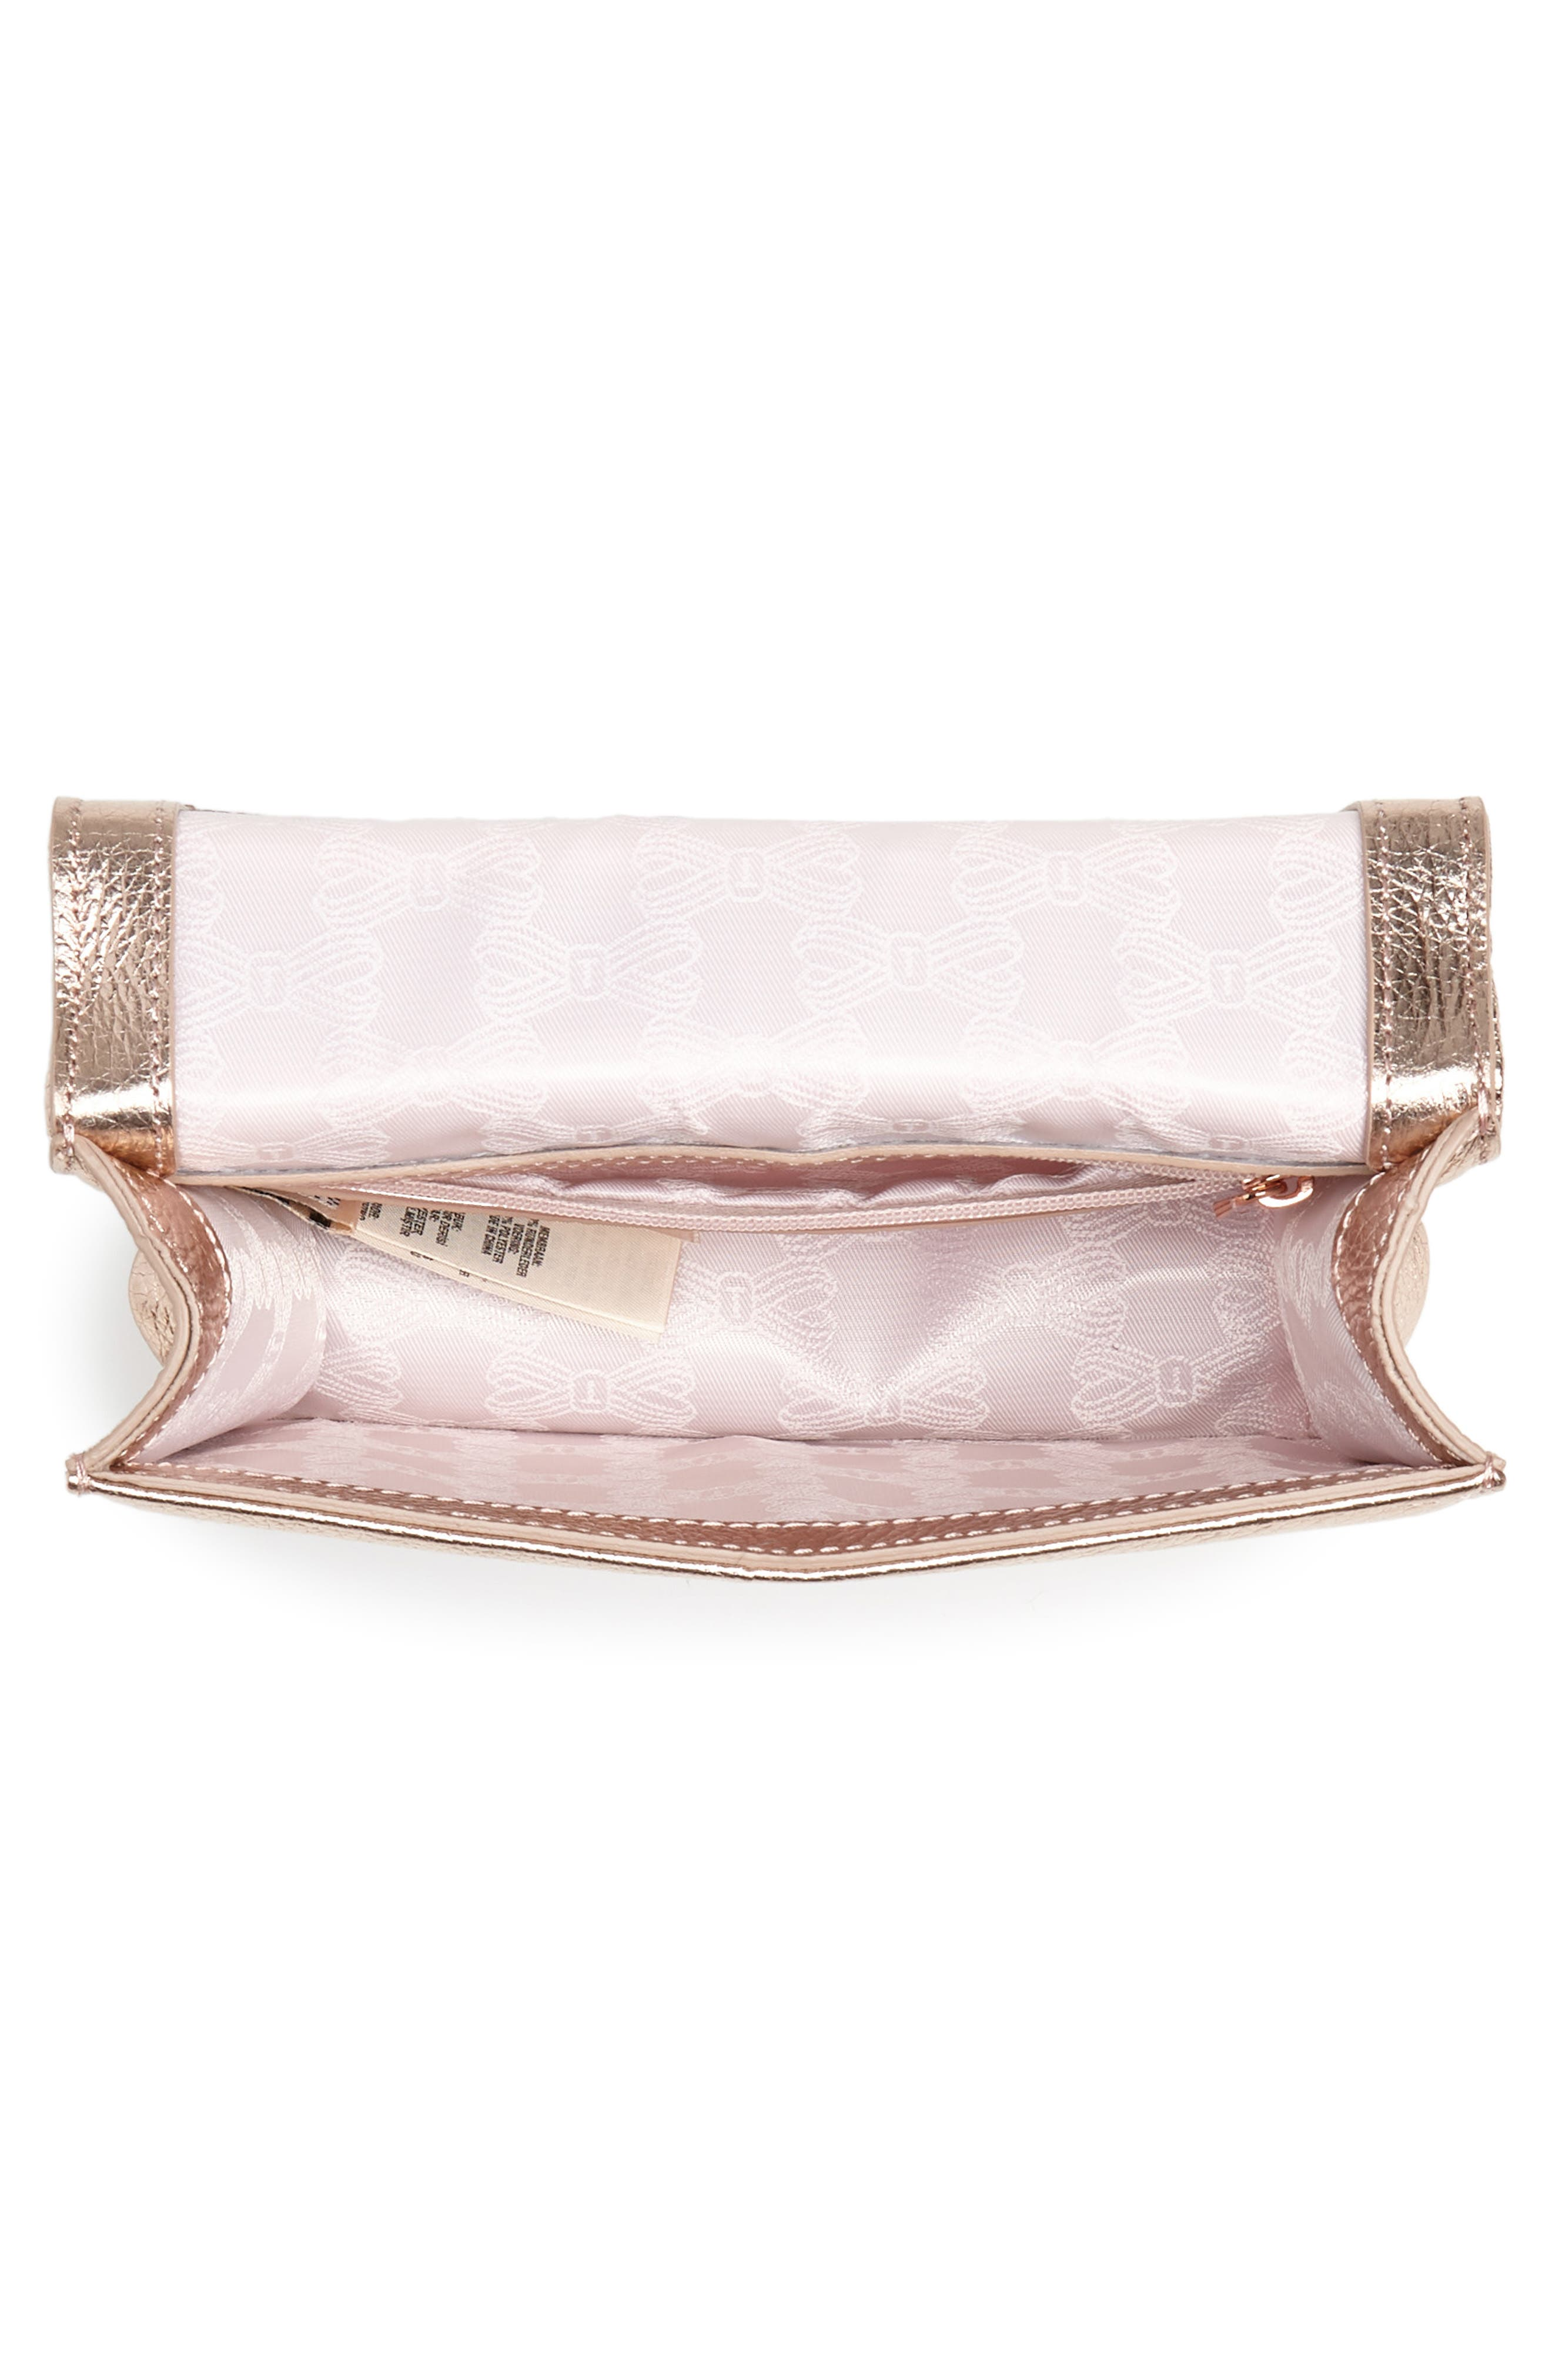 Micro Leather Crossbody Bag,                             Alternate thumbnail 4, color,                             712